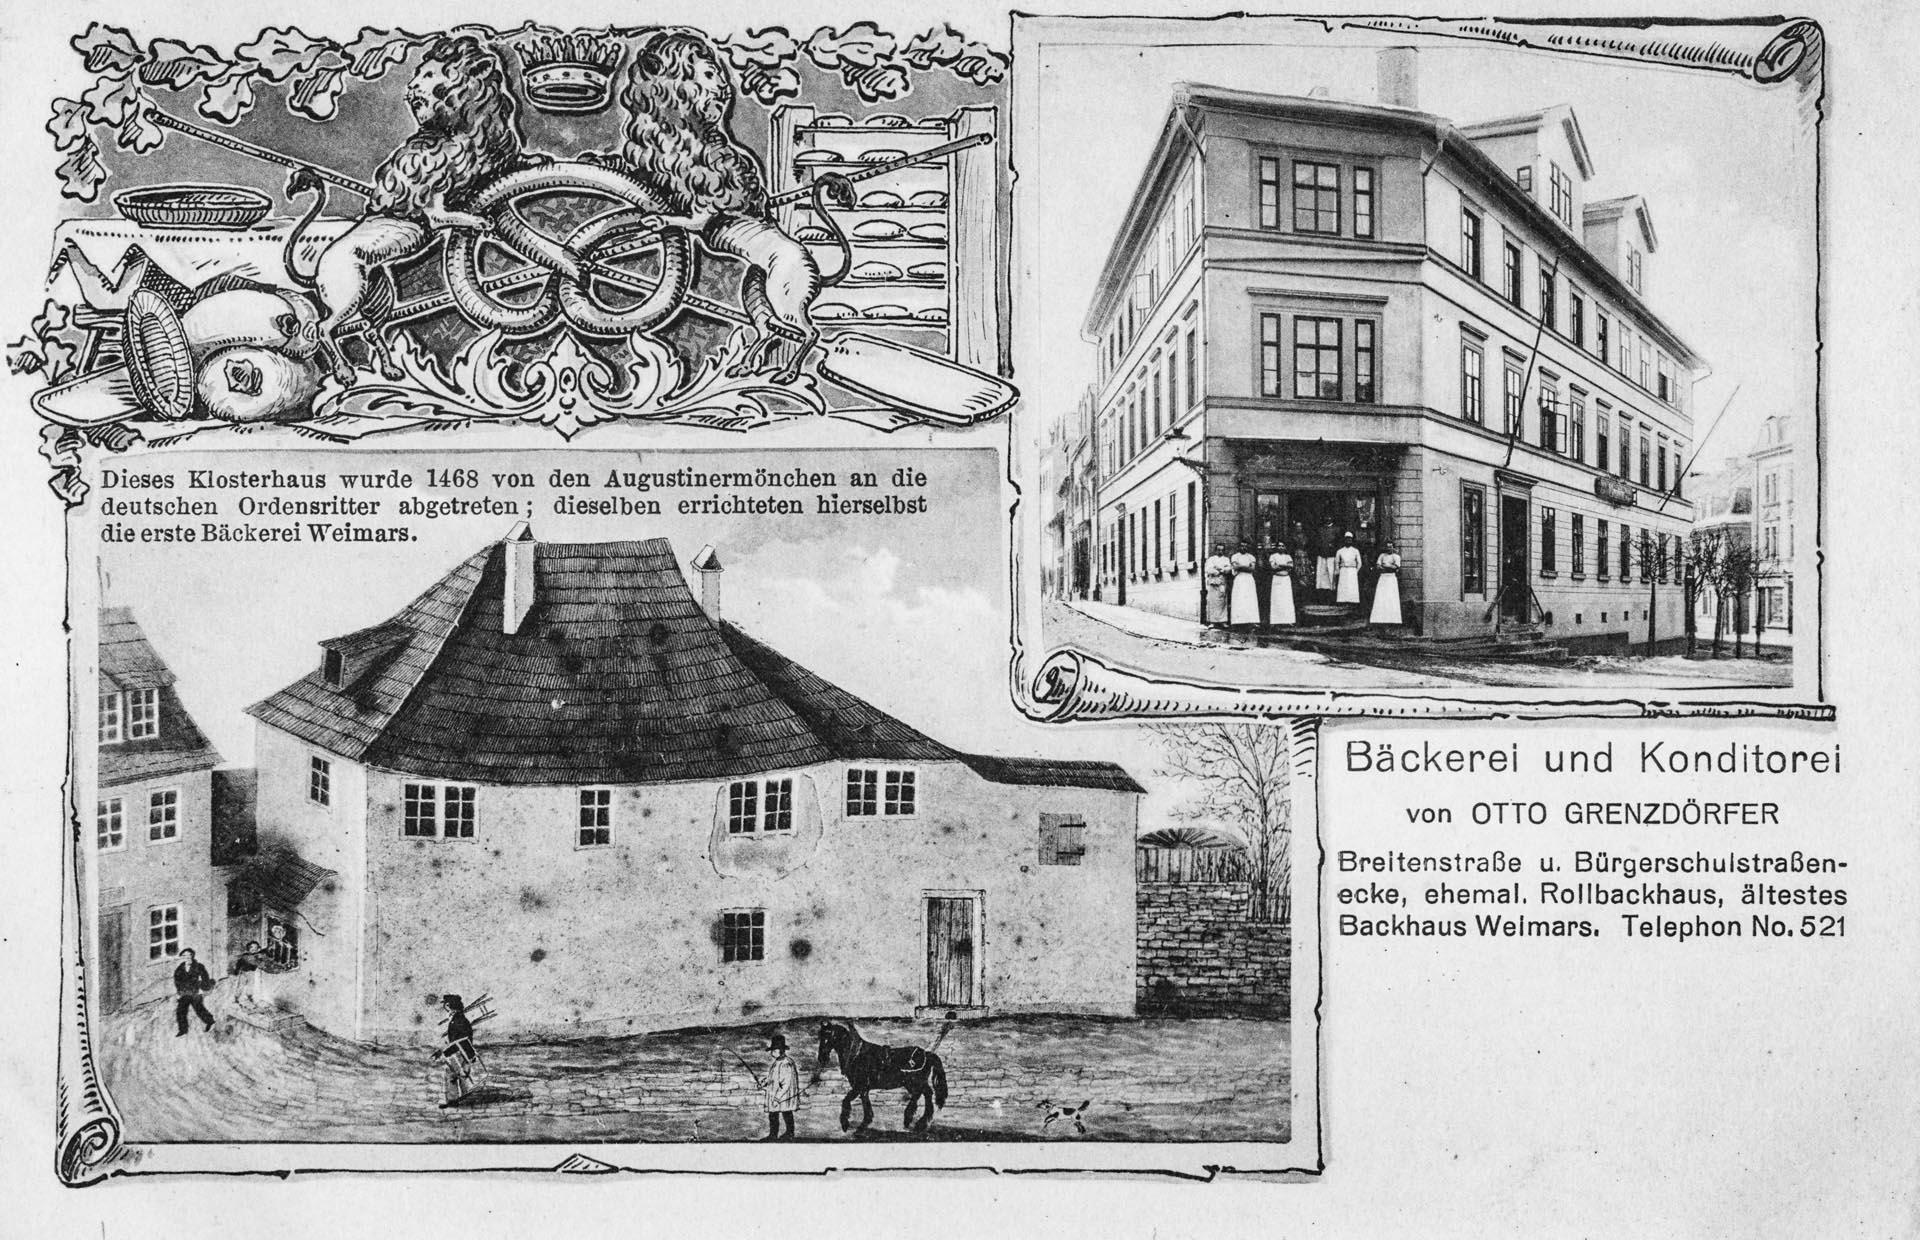 Bäckerei Otto Grenzdörfer, Breitenstraße